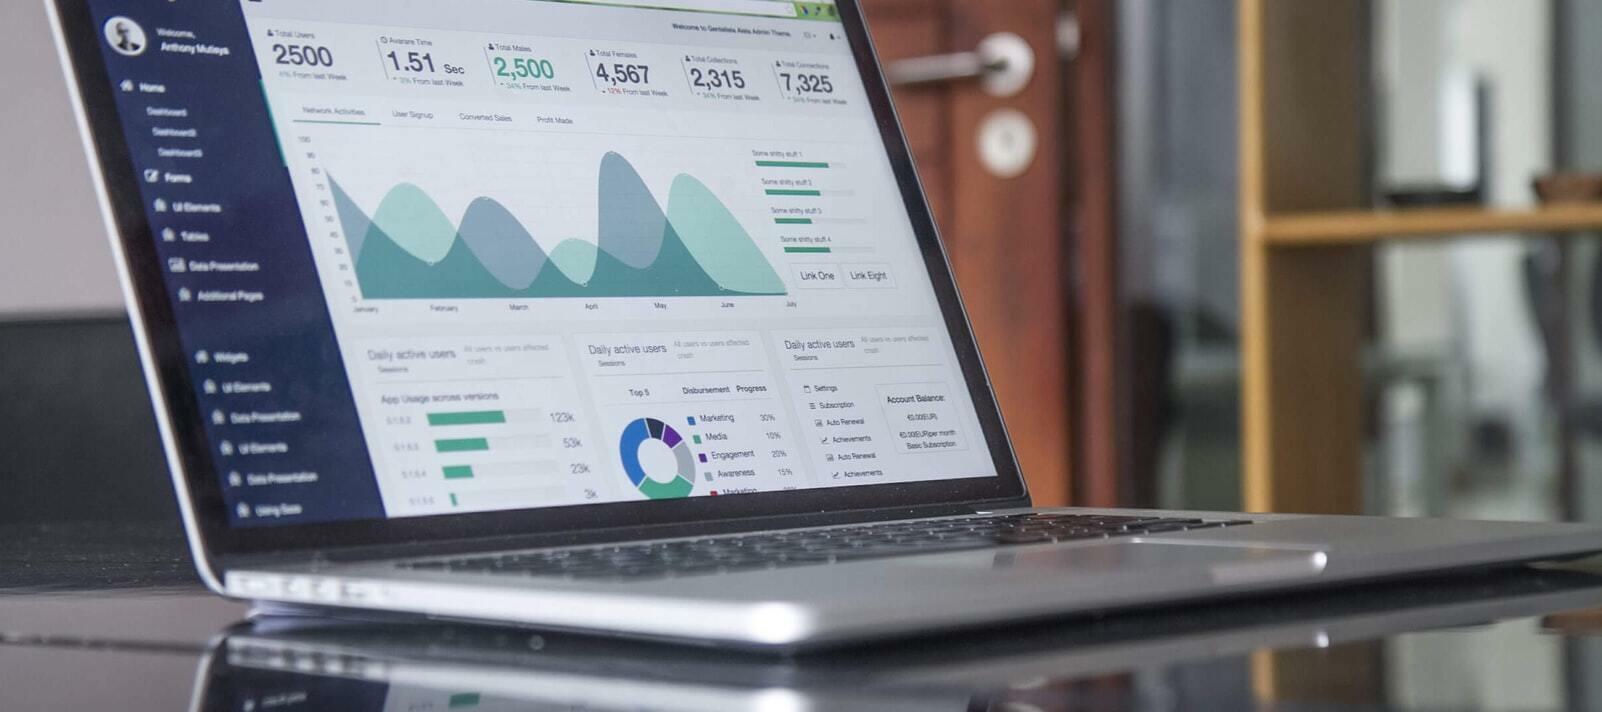 Virtual Customer Advisory - Survey Analytics